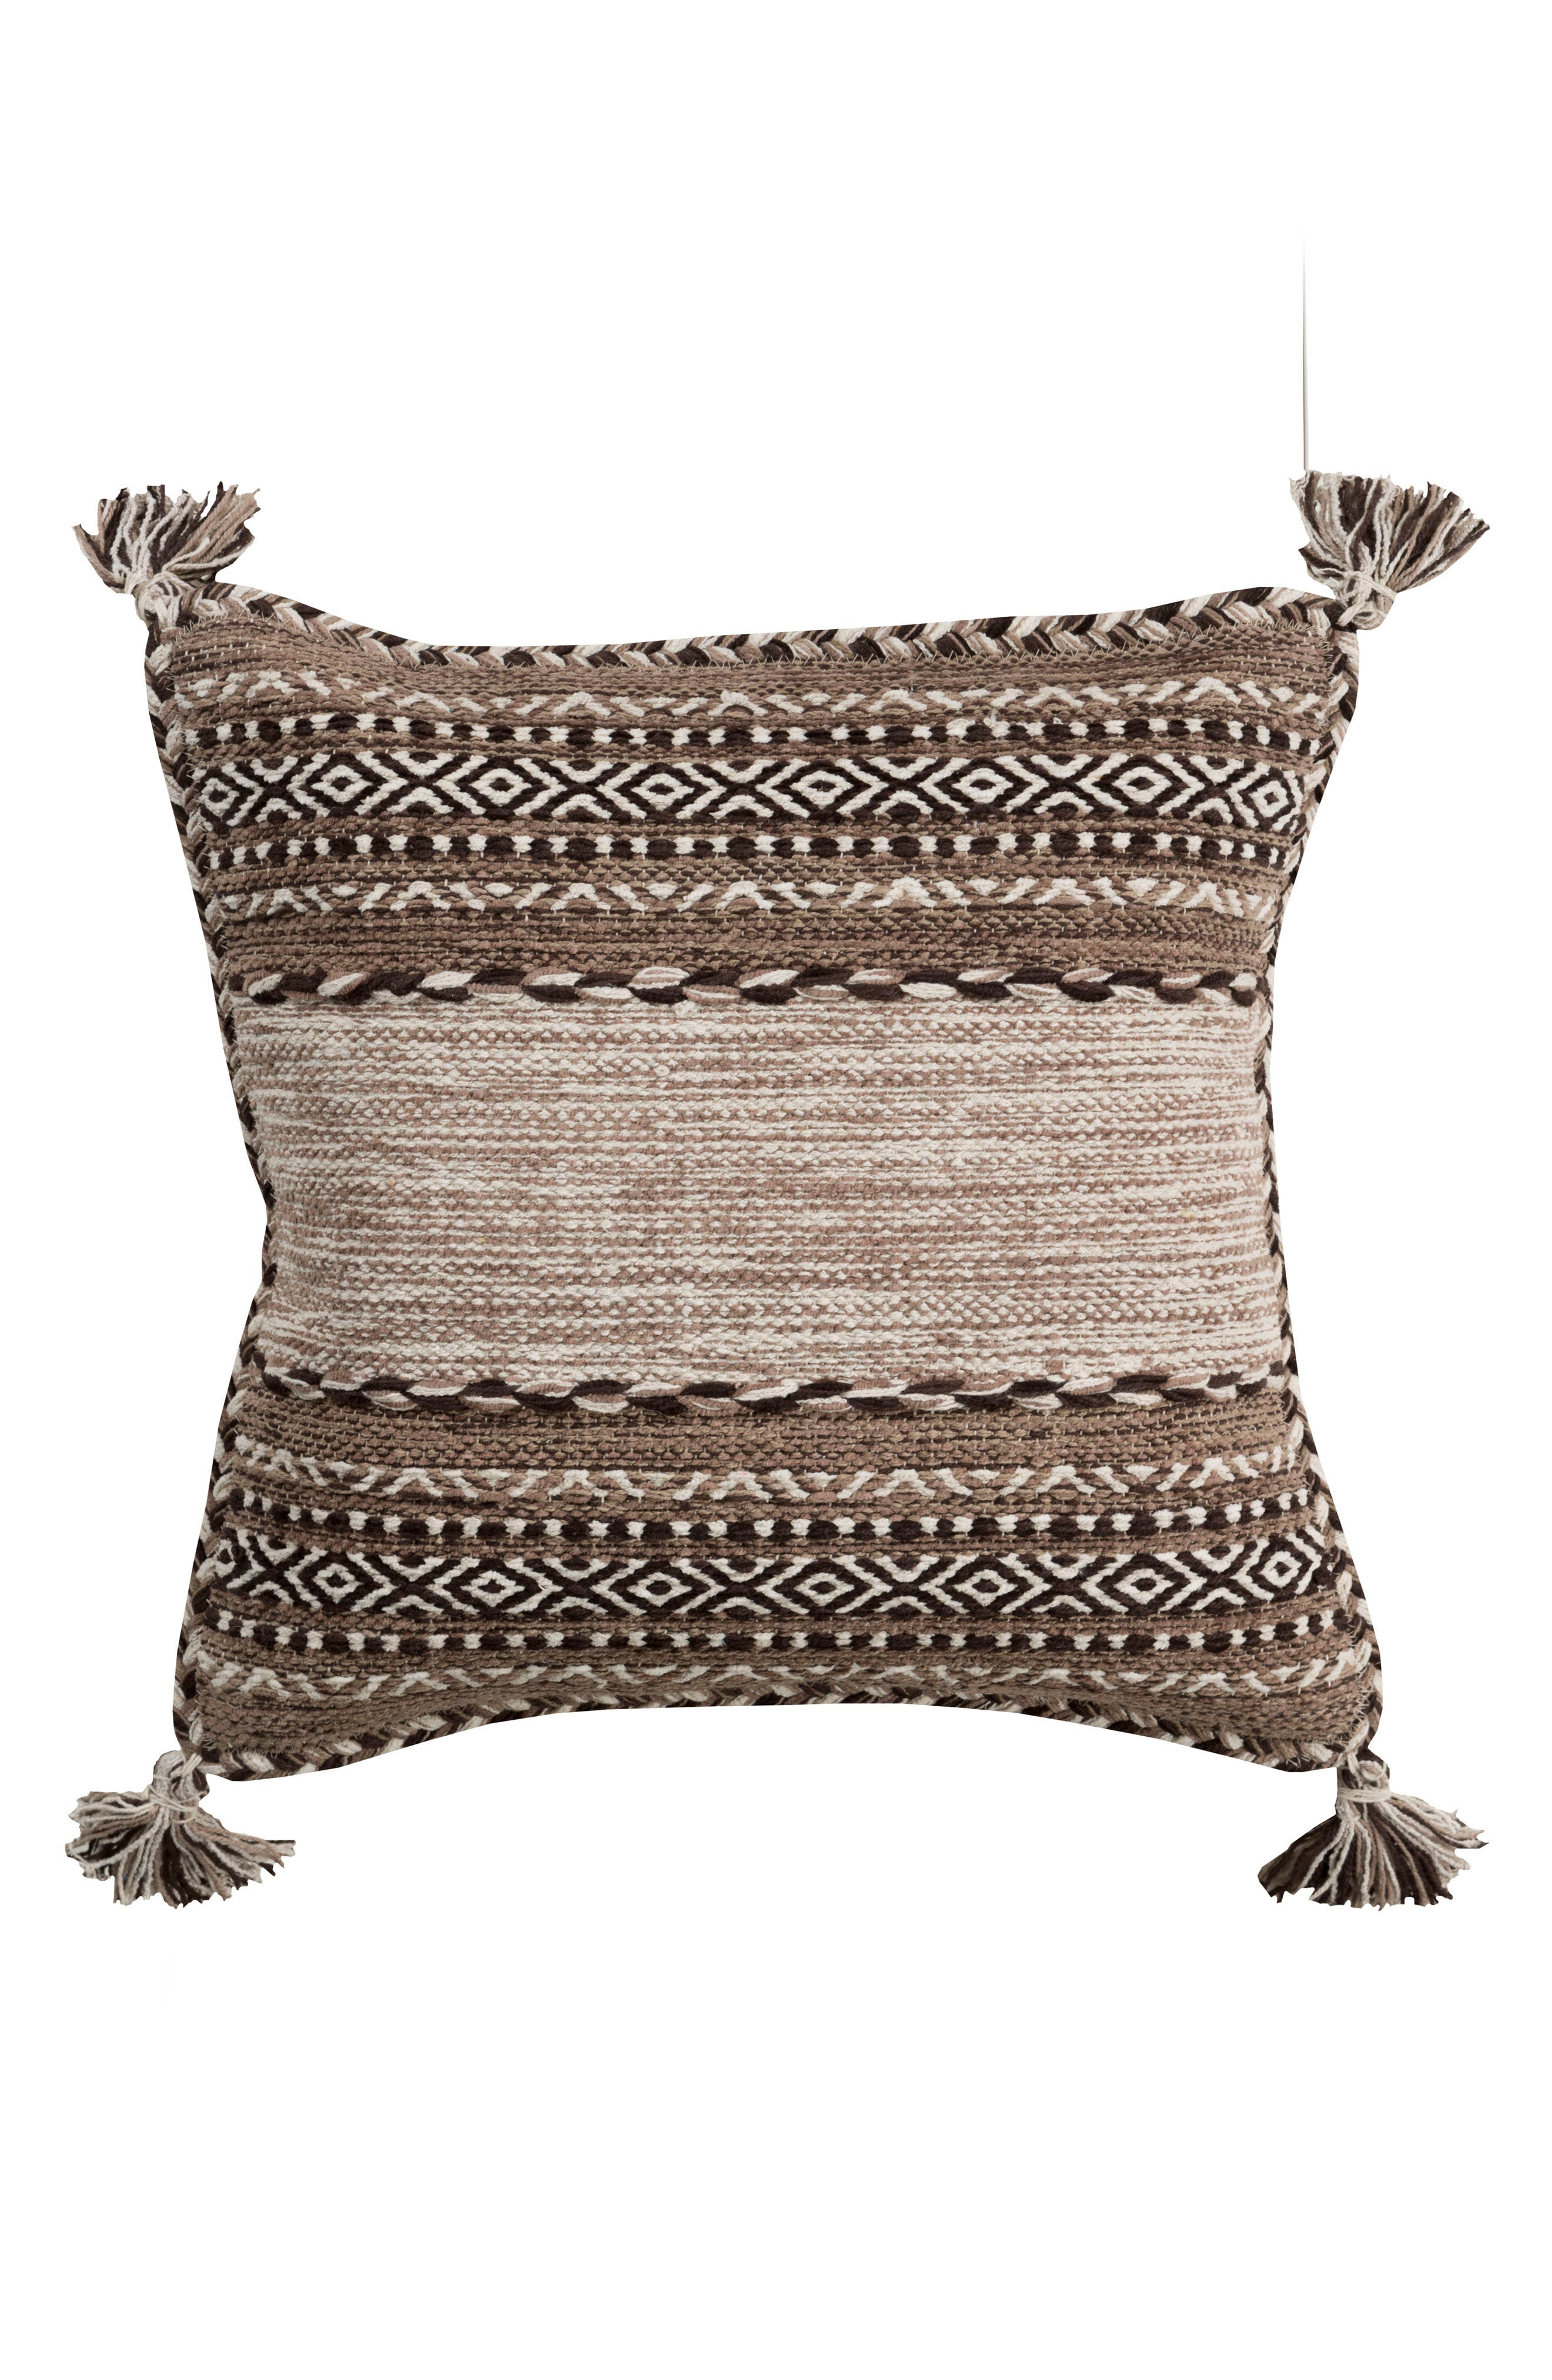 Trenza Pillow,                             Main thumbnail 1, color,                             CAMEL/ BROWN/ IVORY